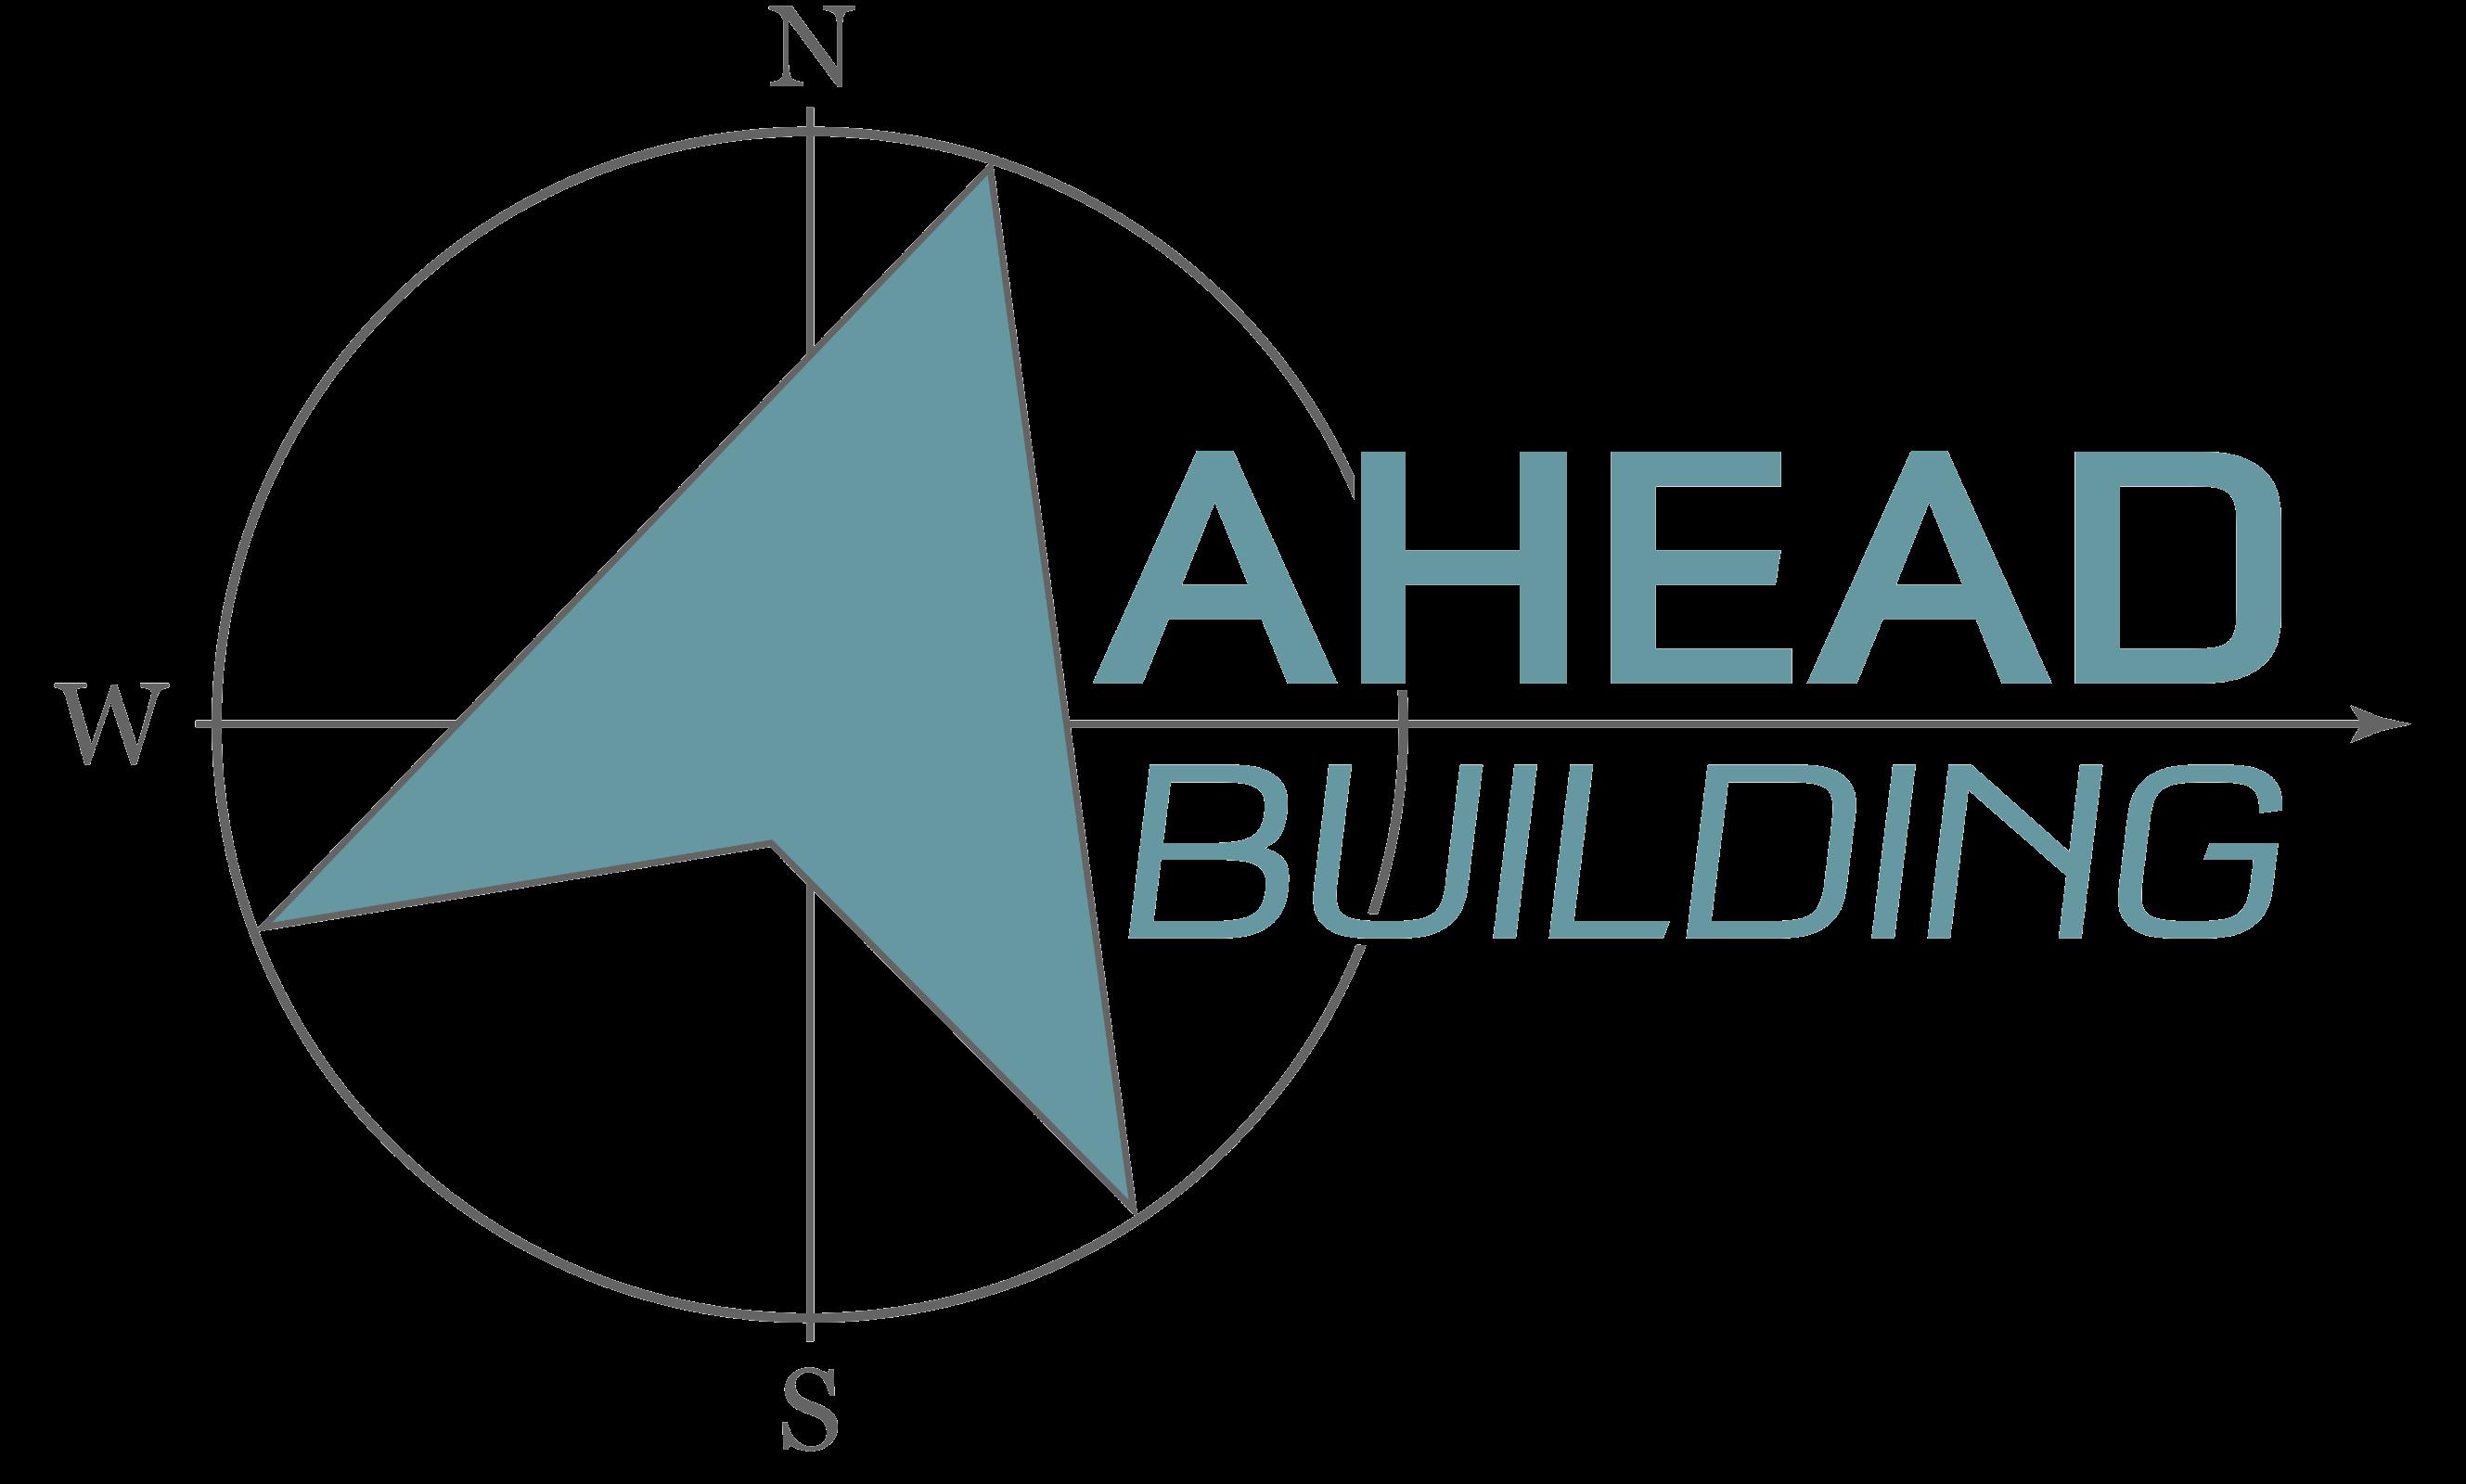 ahead building logo